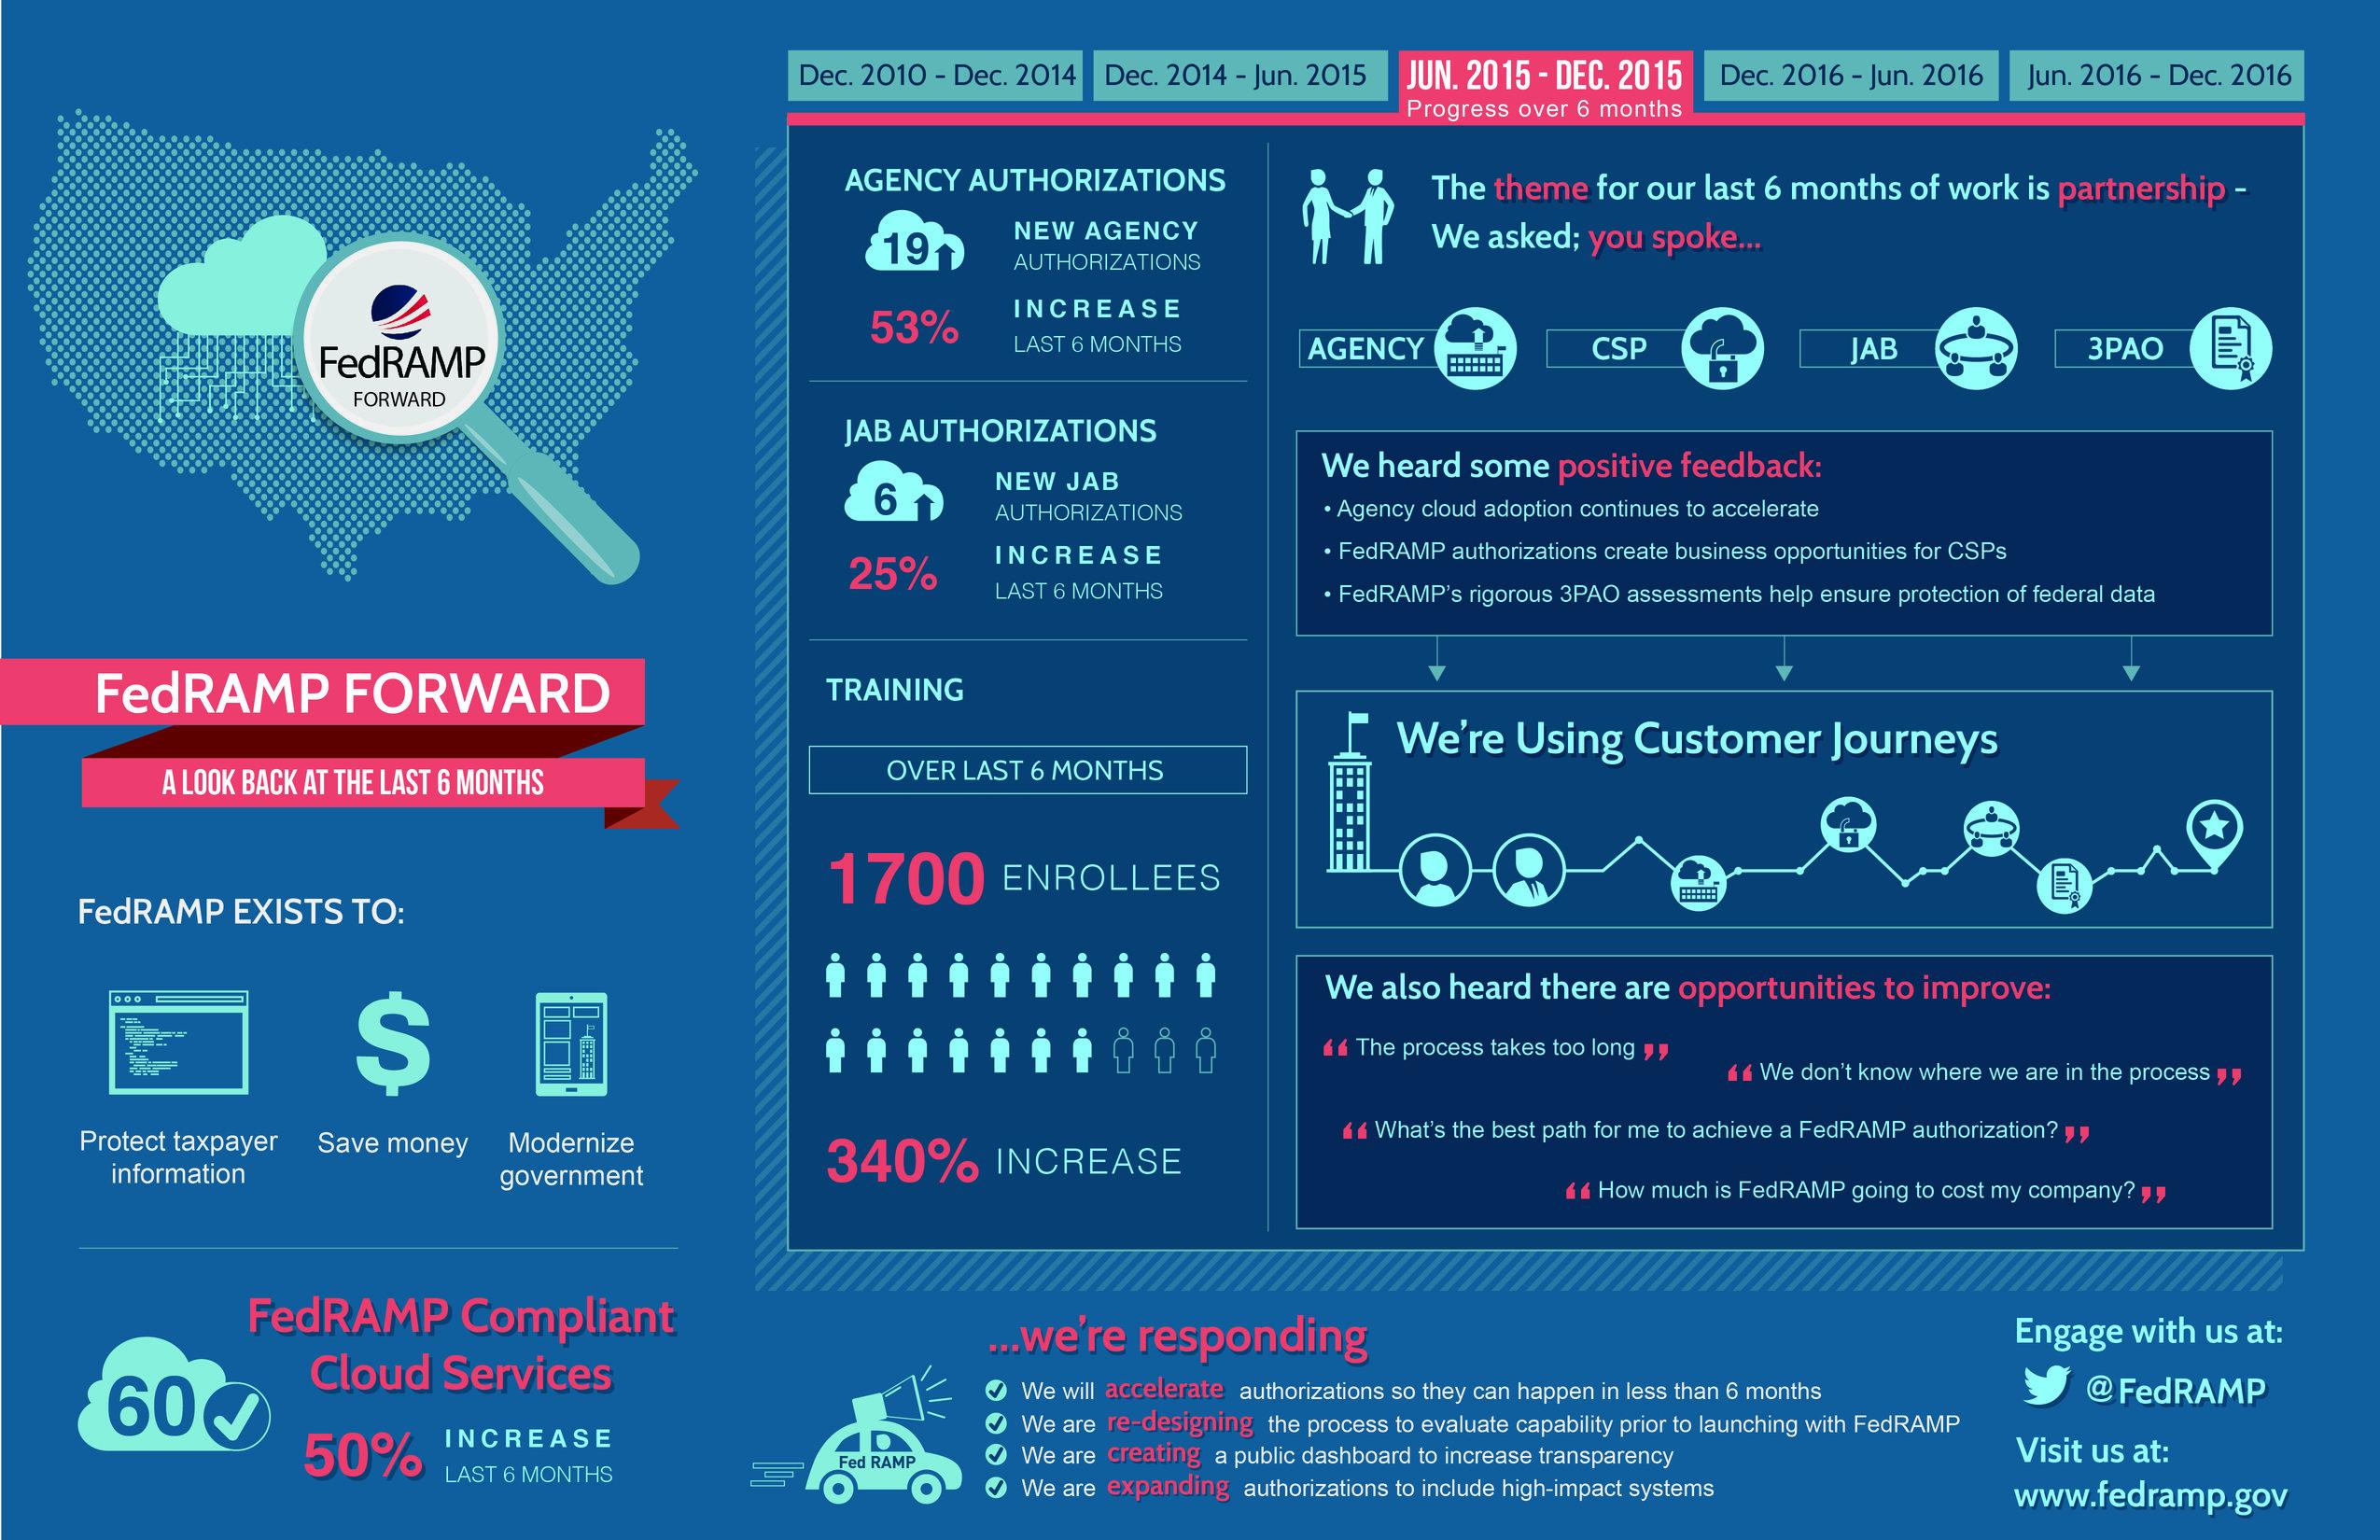 FedRAMP Forward Infographic